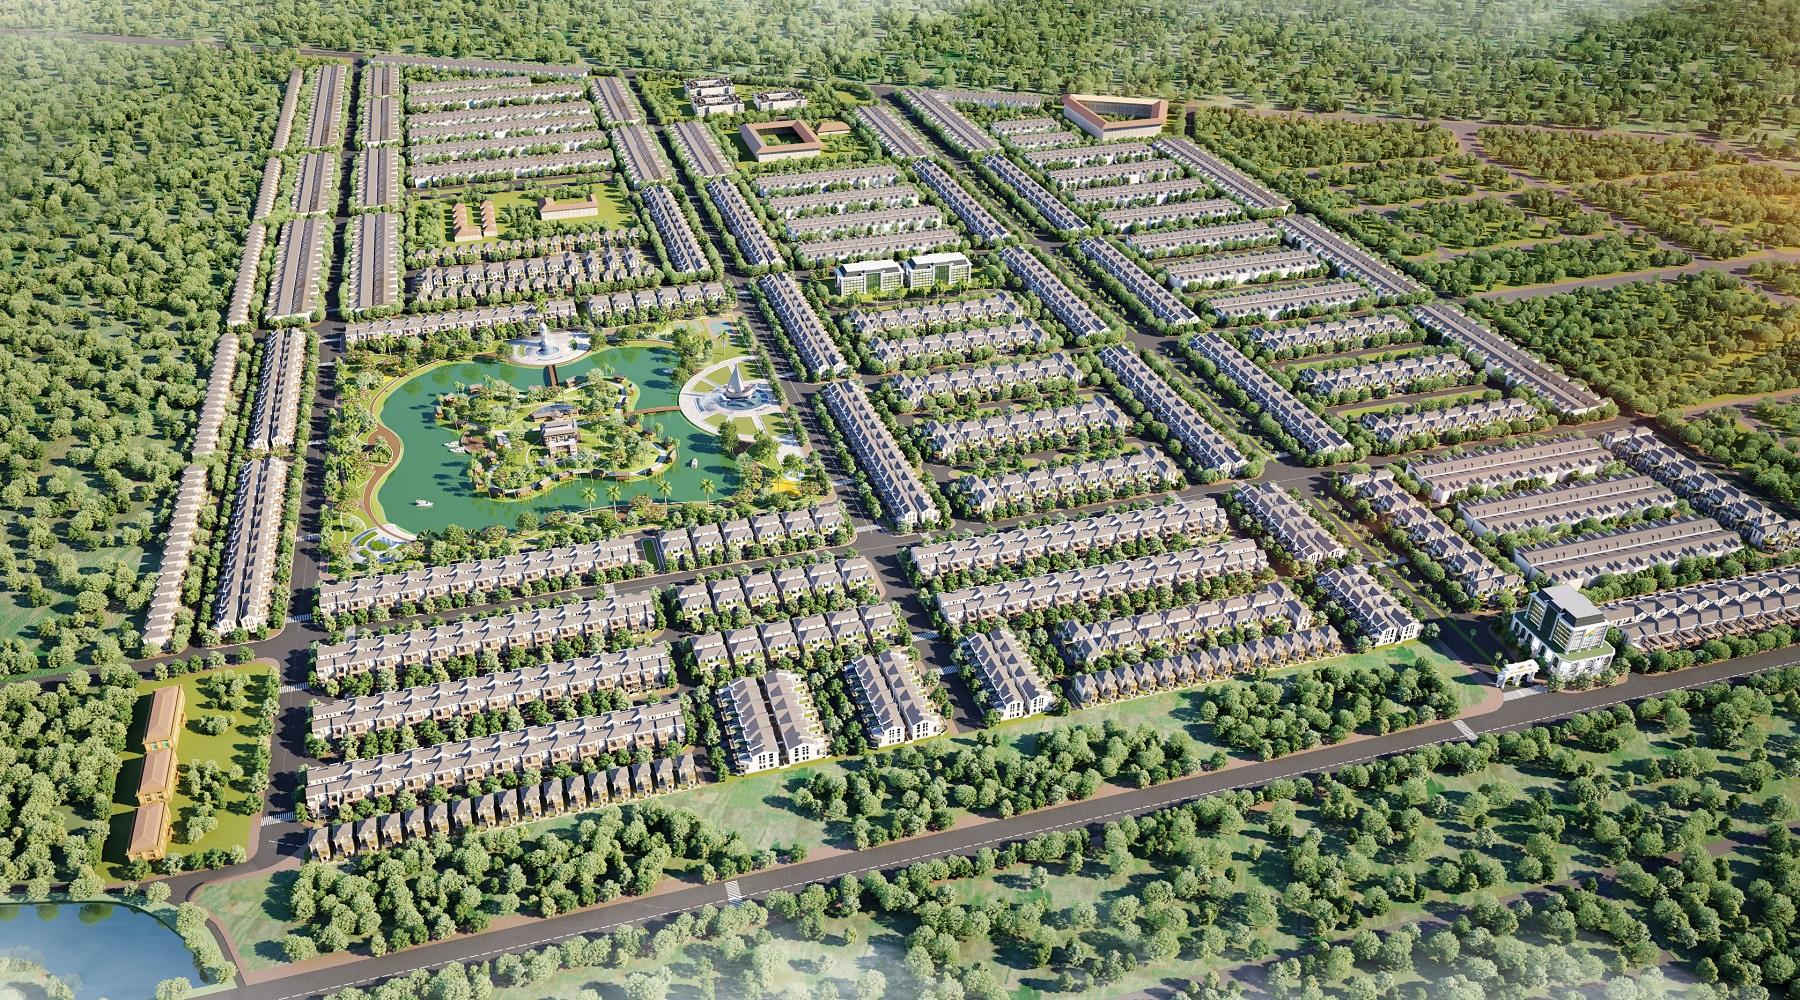 http://charmington.org/public/upload/ca-mau-new-city-tng-th-1573801177.jpg